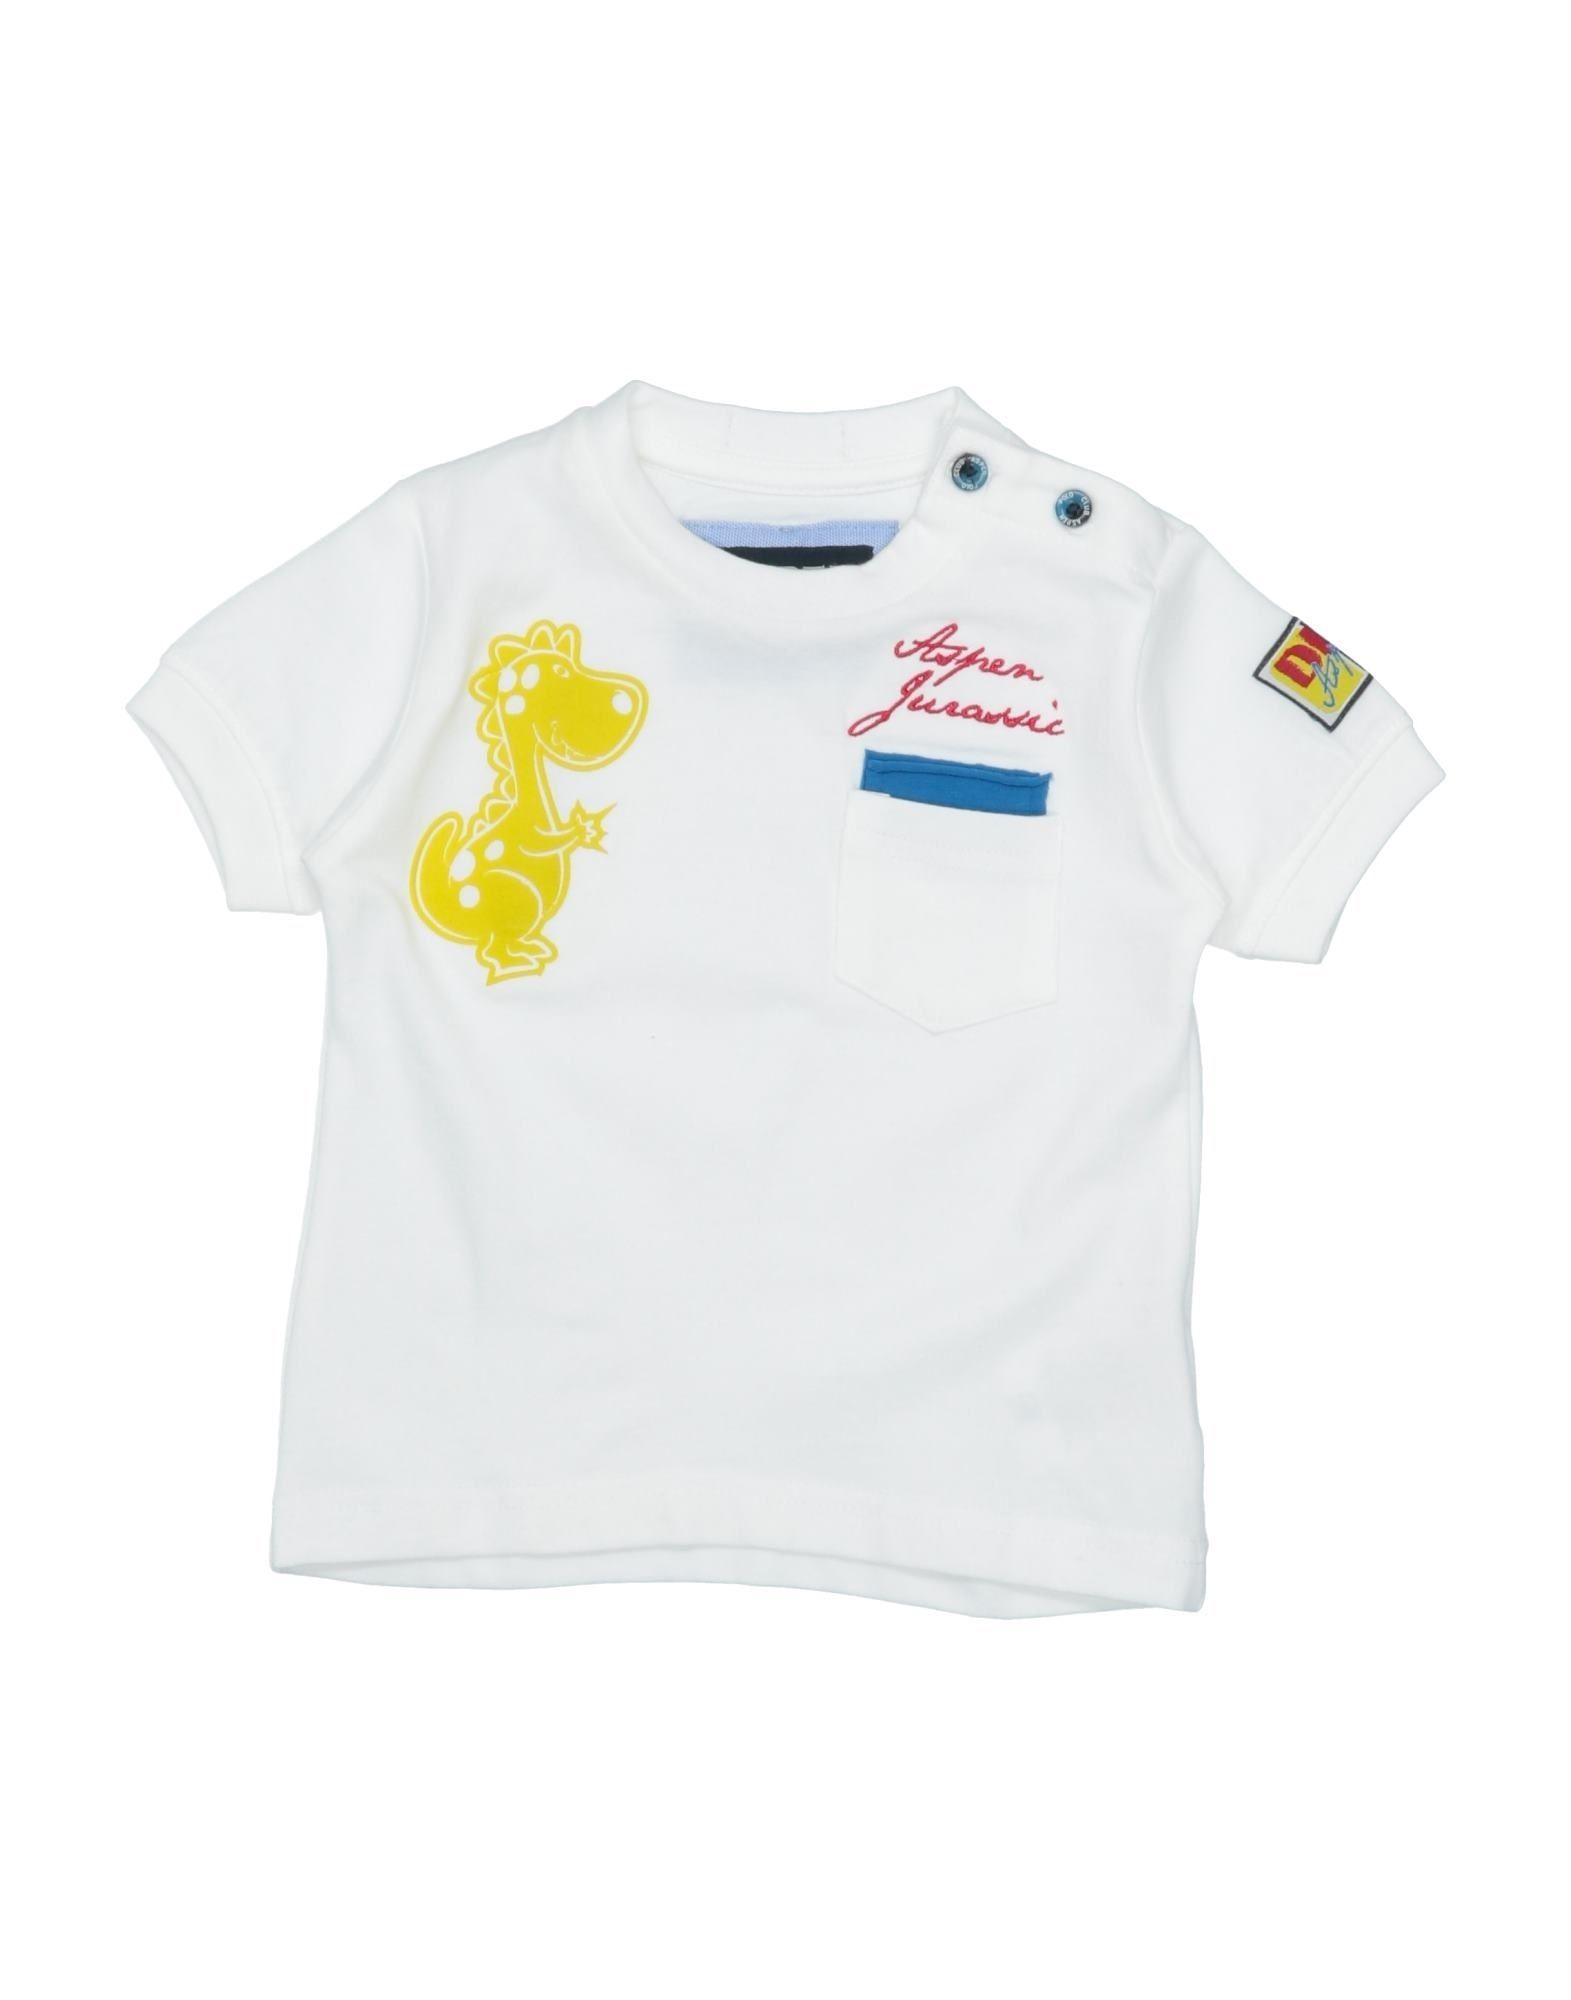 Aspen Polo Club Kids' T-shirts In White